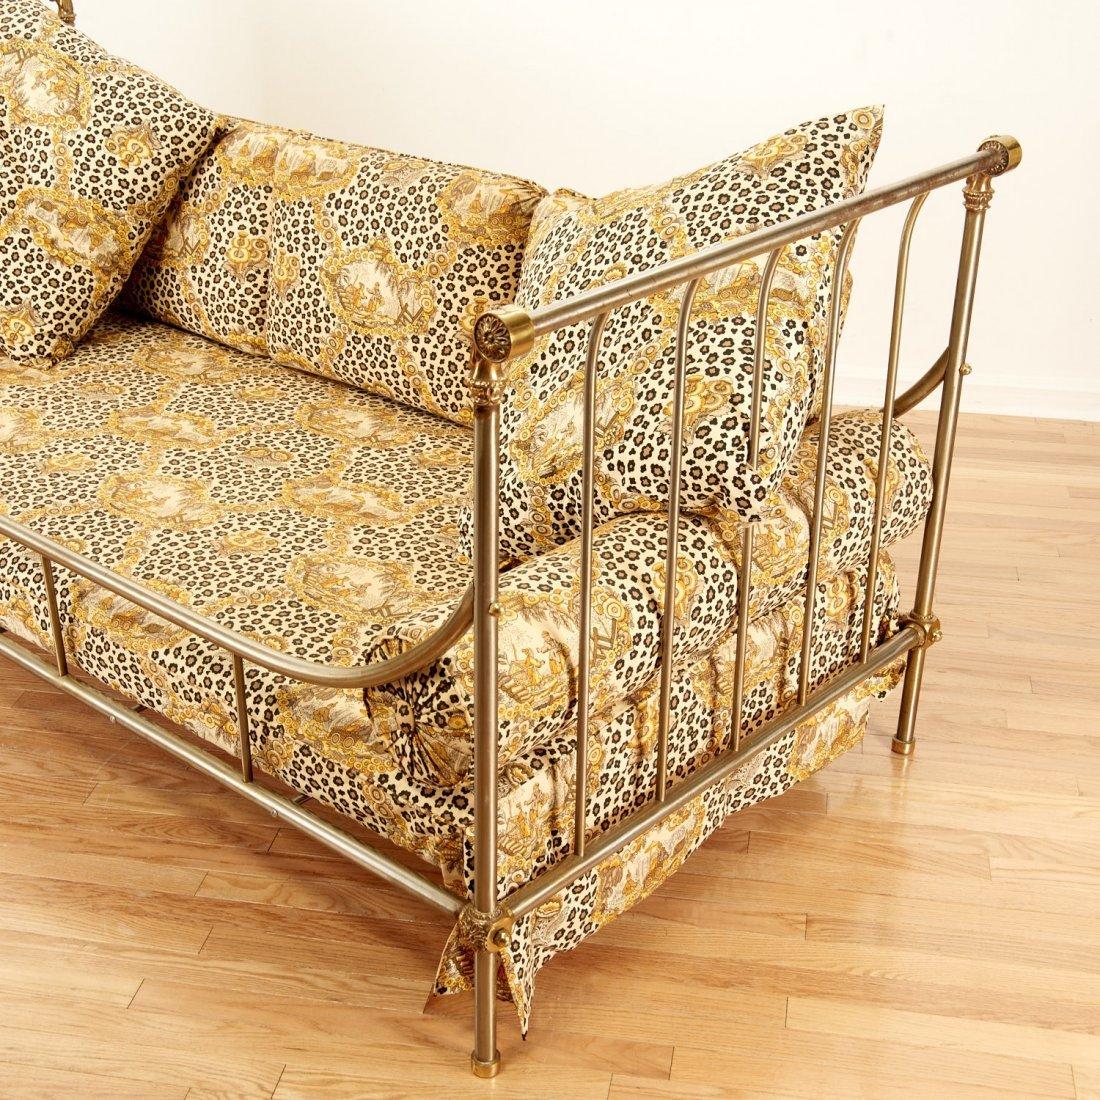 Maison Jansen style brass, steel campaign bed - 5